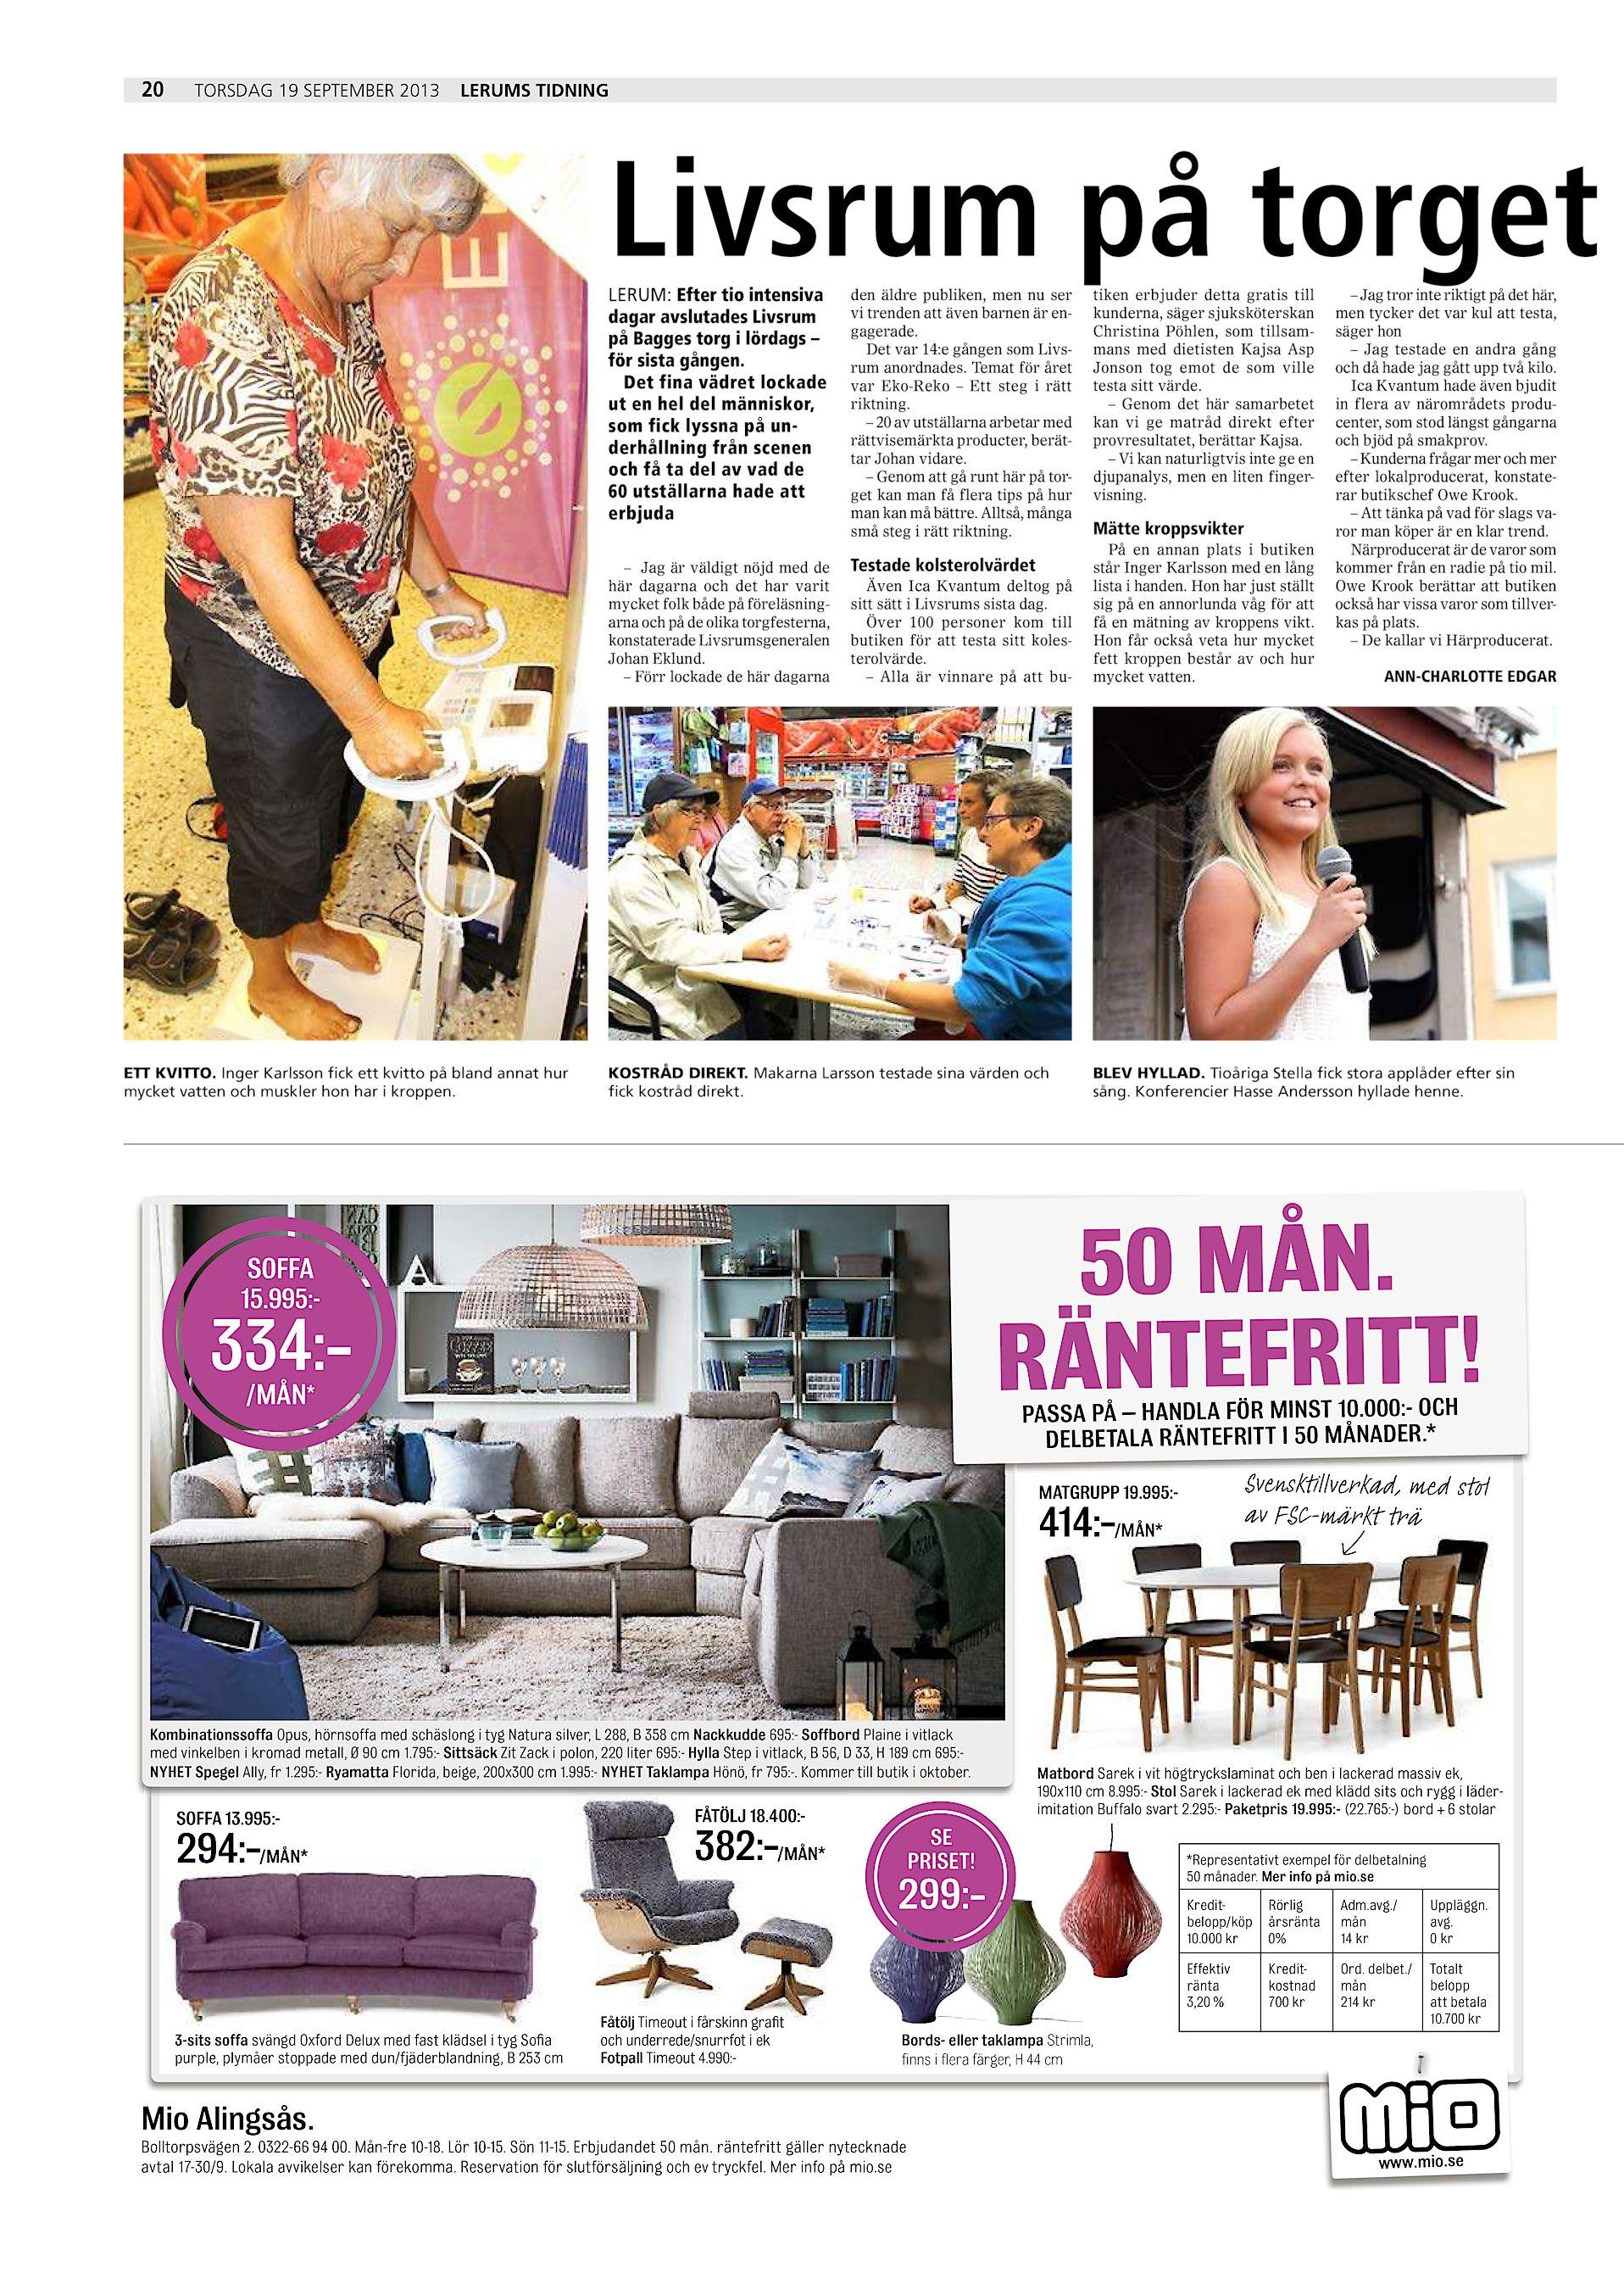 Lerums tidning LT 2013 09 19 (endast text)